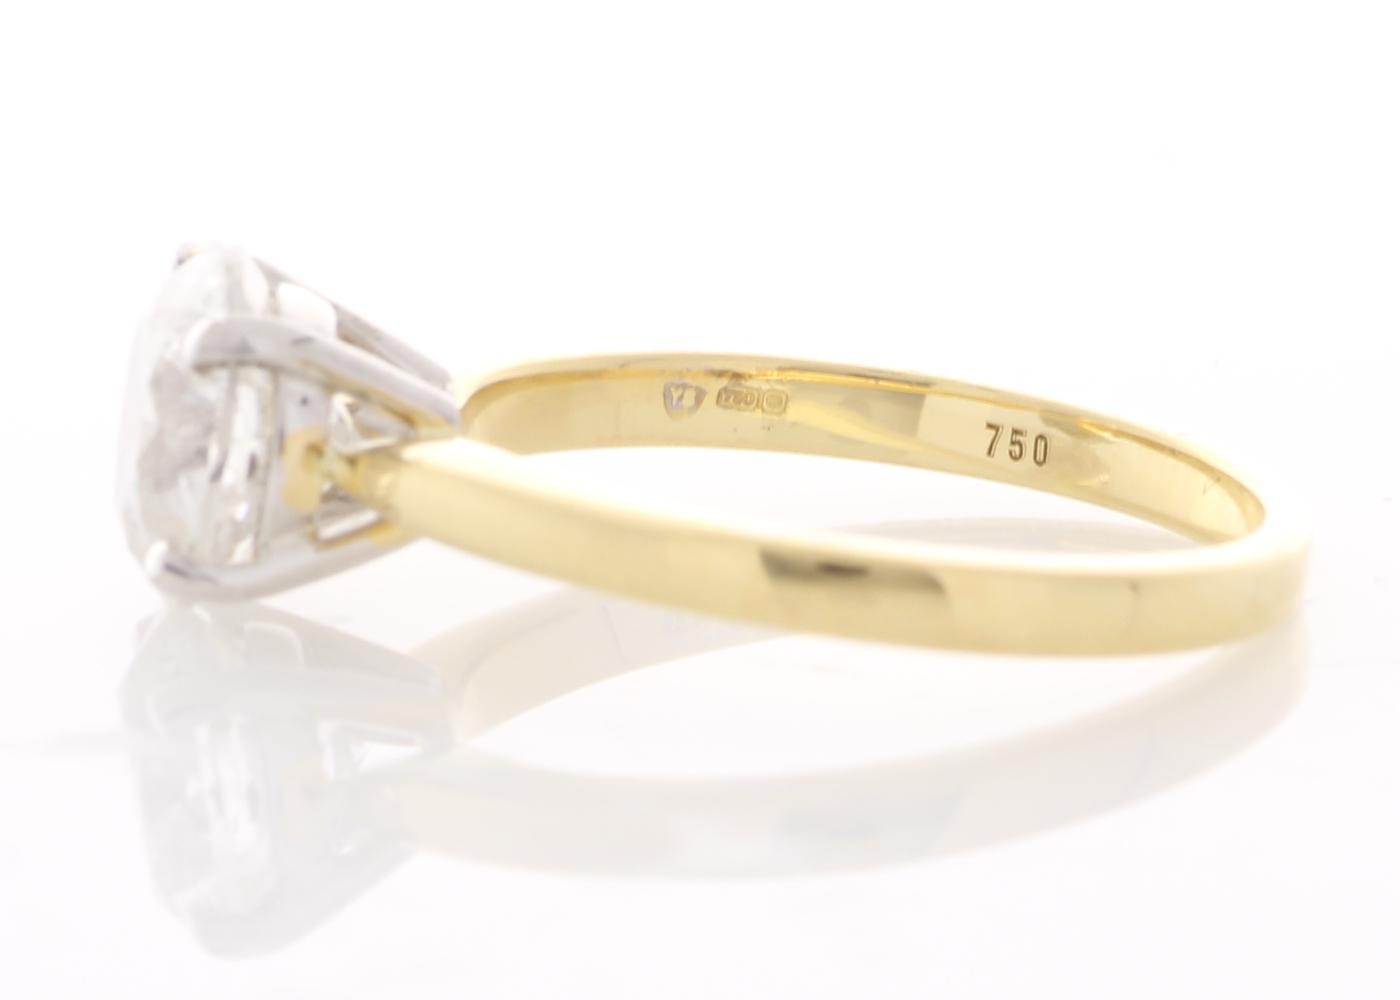 18ct Yellow Gold Single Stone Prong Set Diamond Ring 2.00 Carats - Image 2 of 5